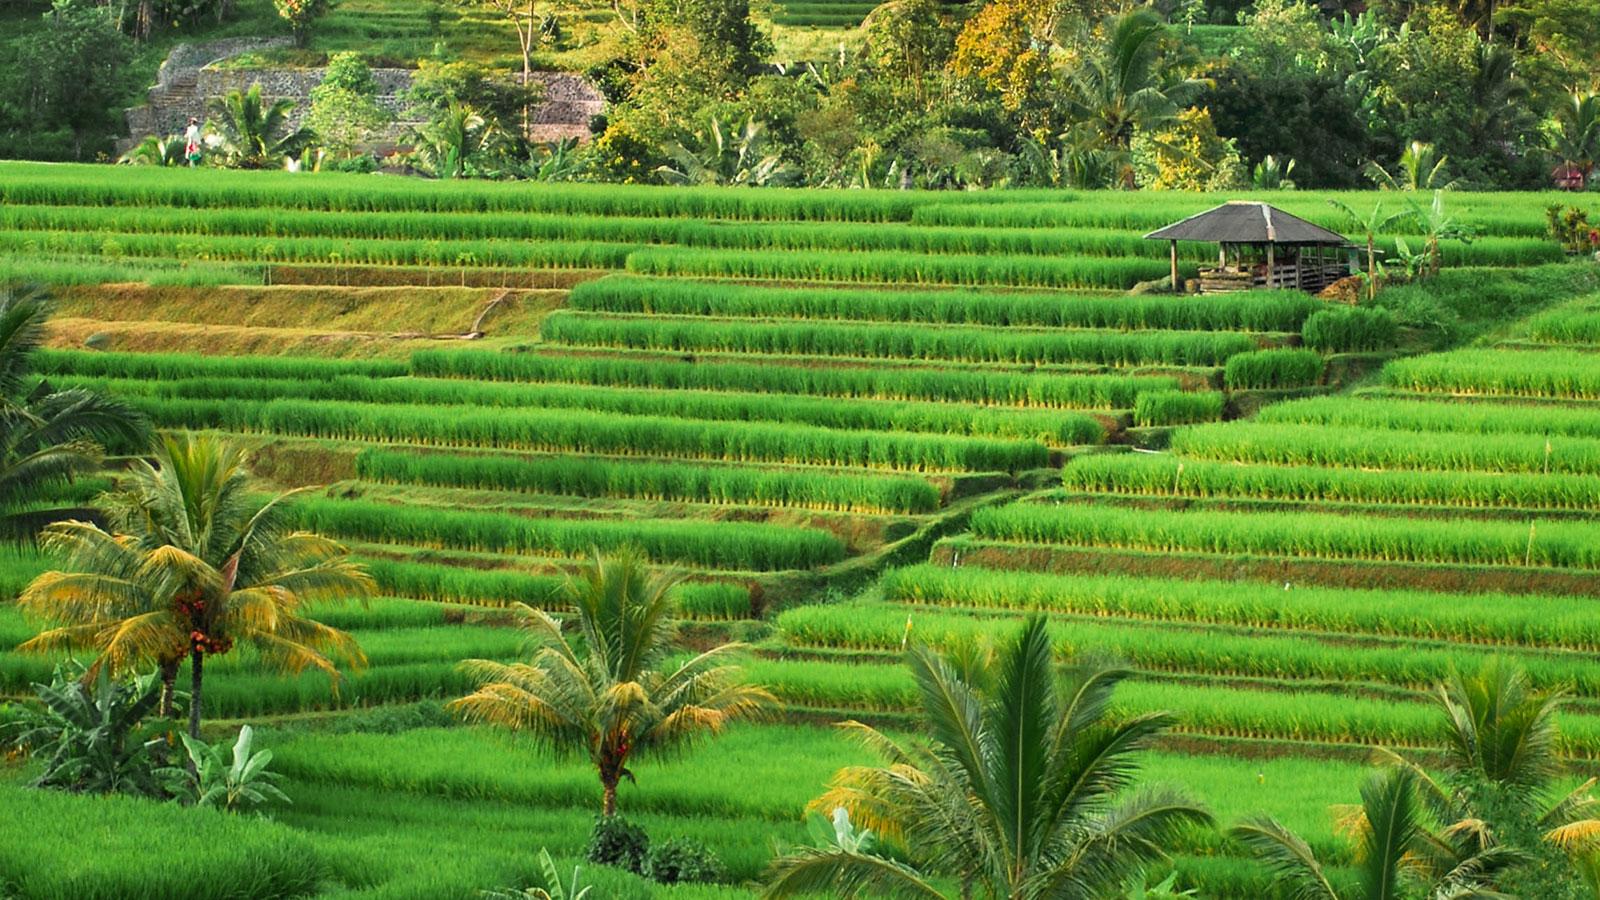 Bali Bagus Tours - Jatiluwih